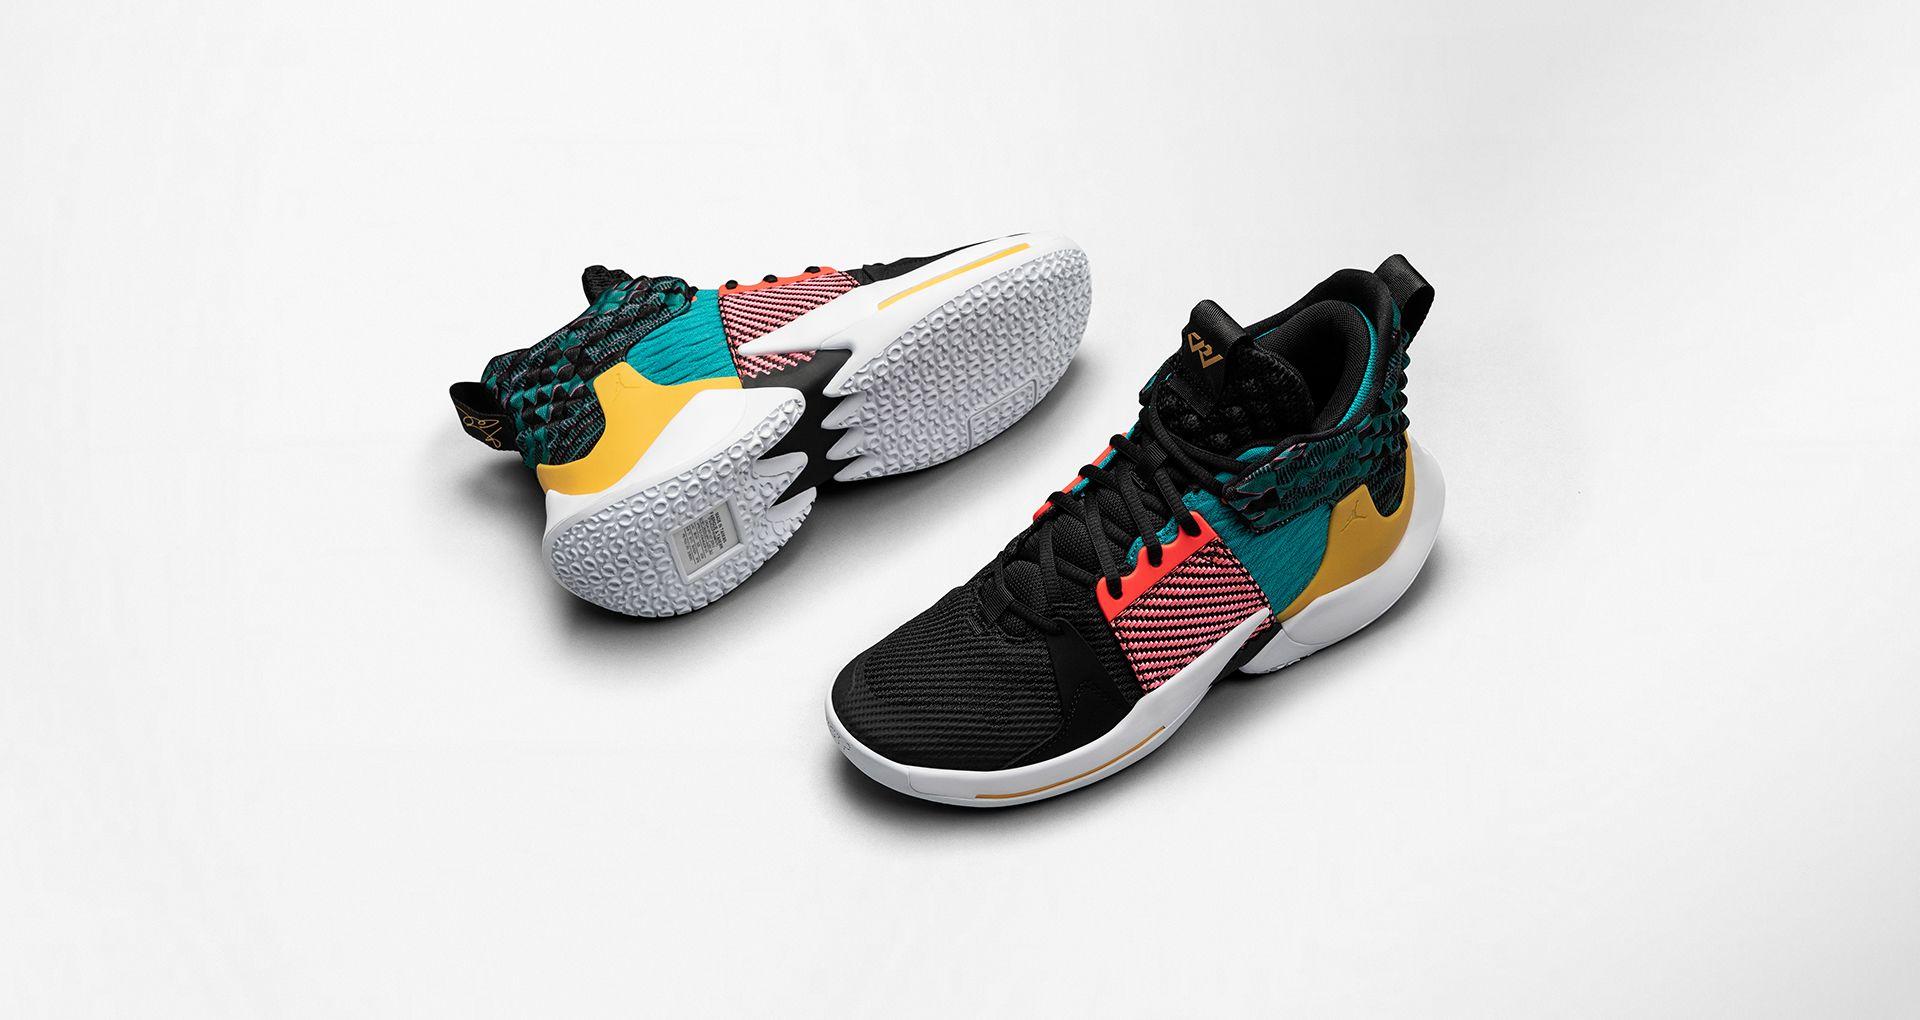 detailed look 5ecb2 57194 Jordan Why Not Zer0.2  BHM  Release Date. Nike+ SNKRS